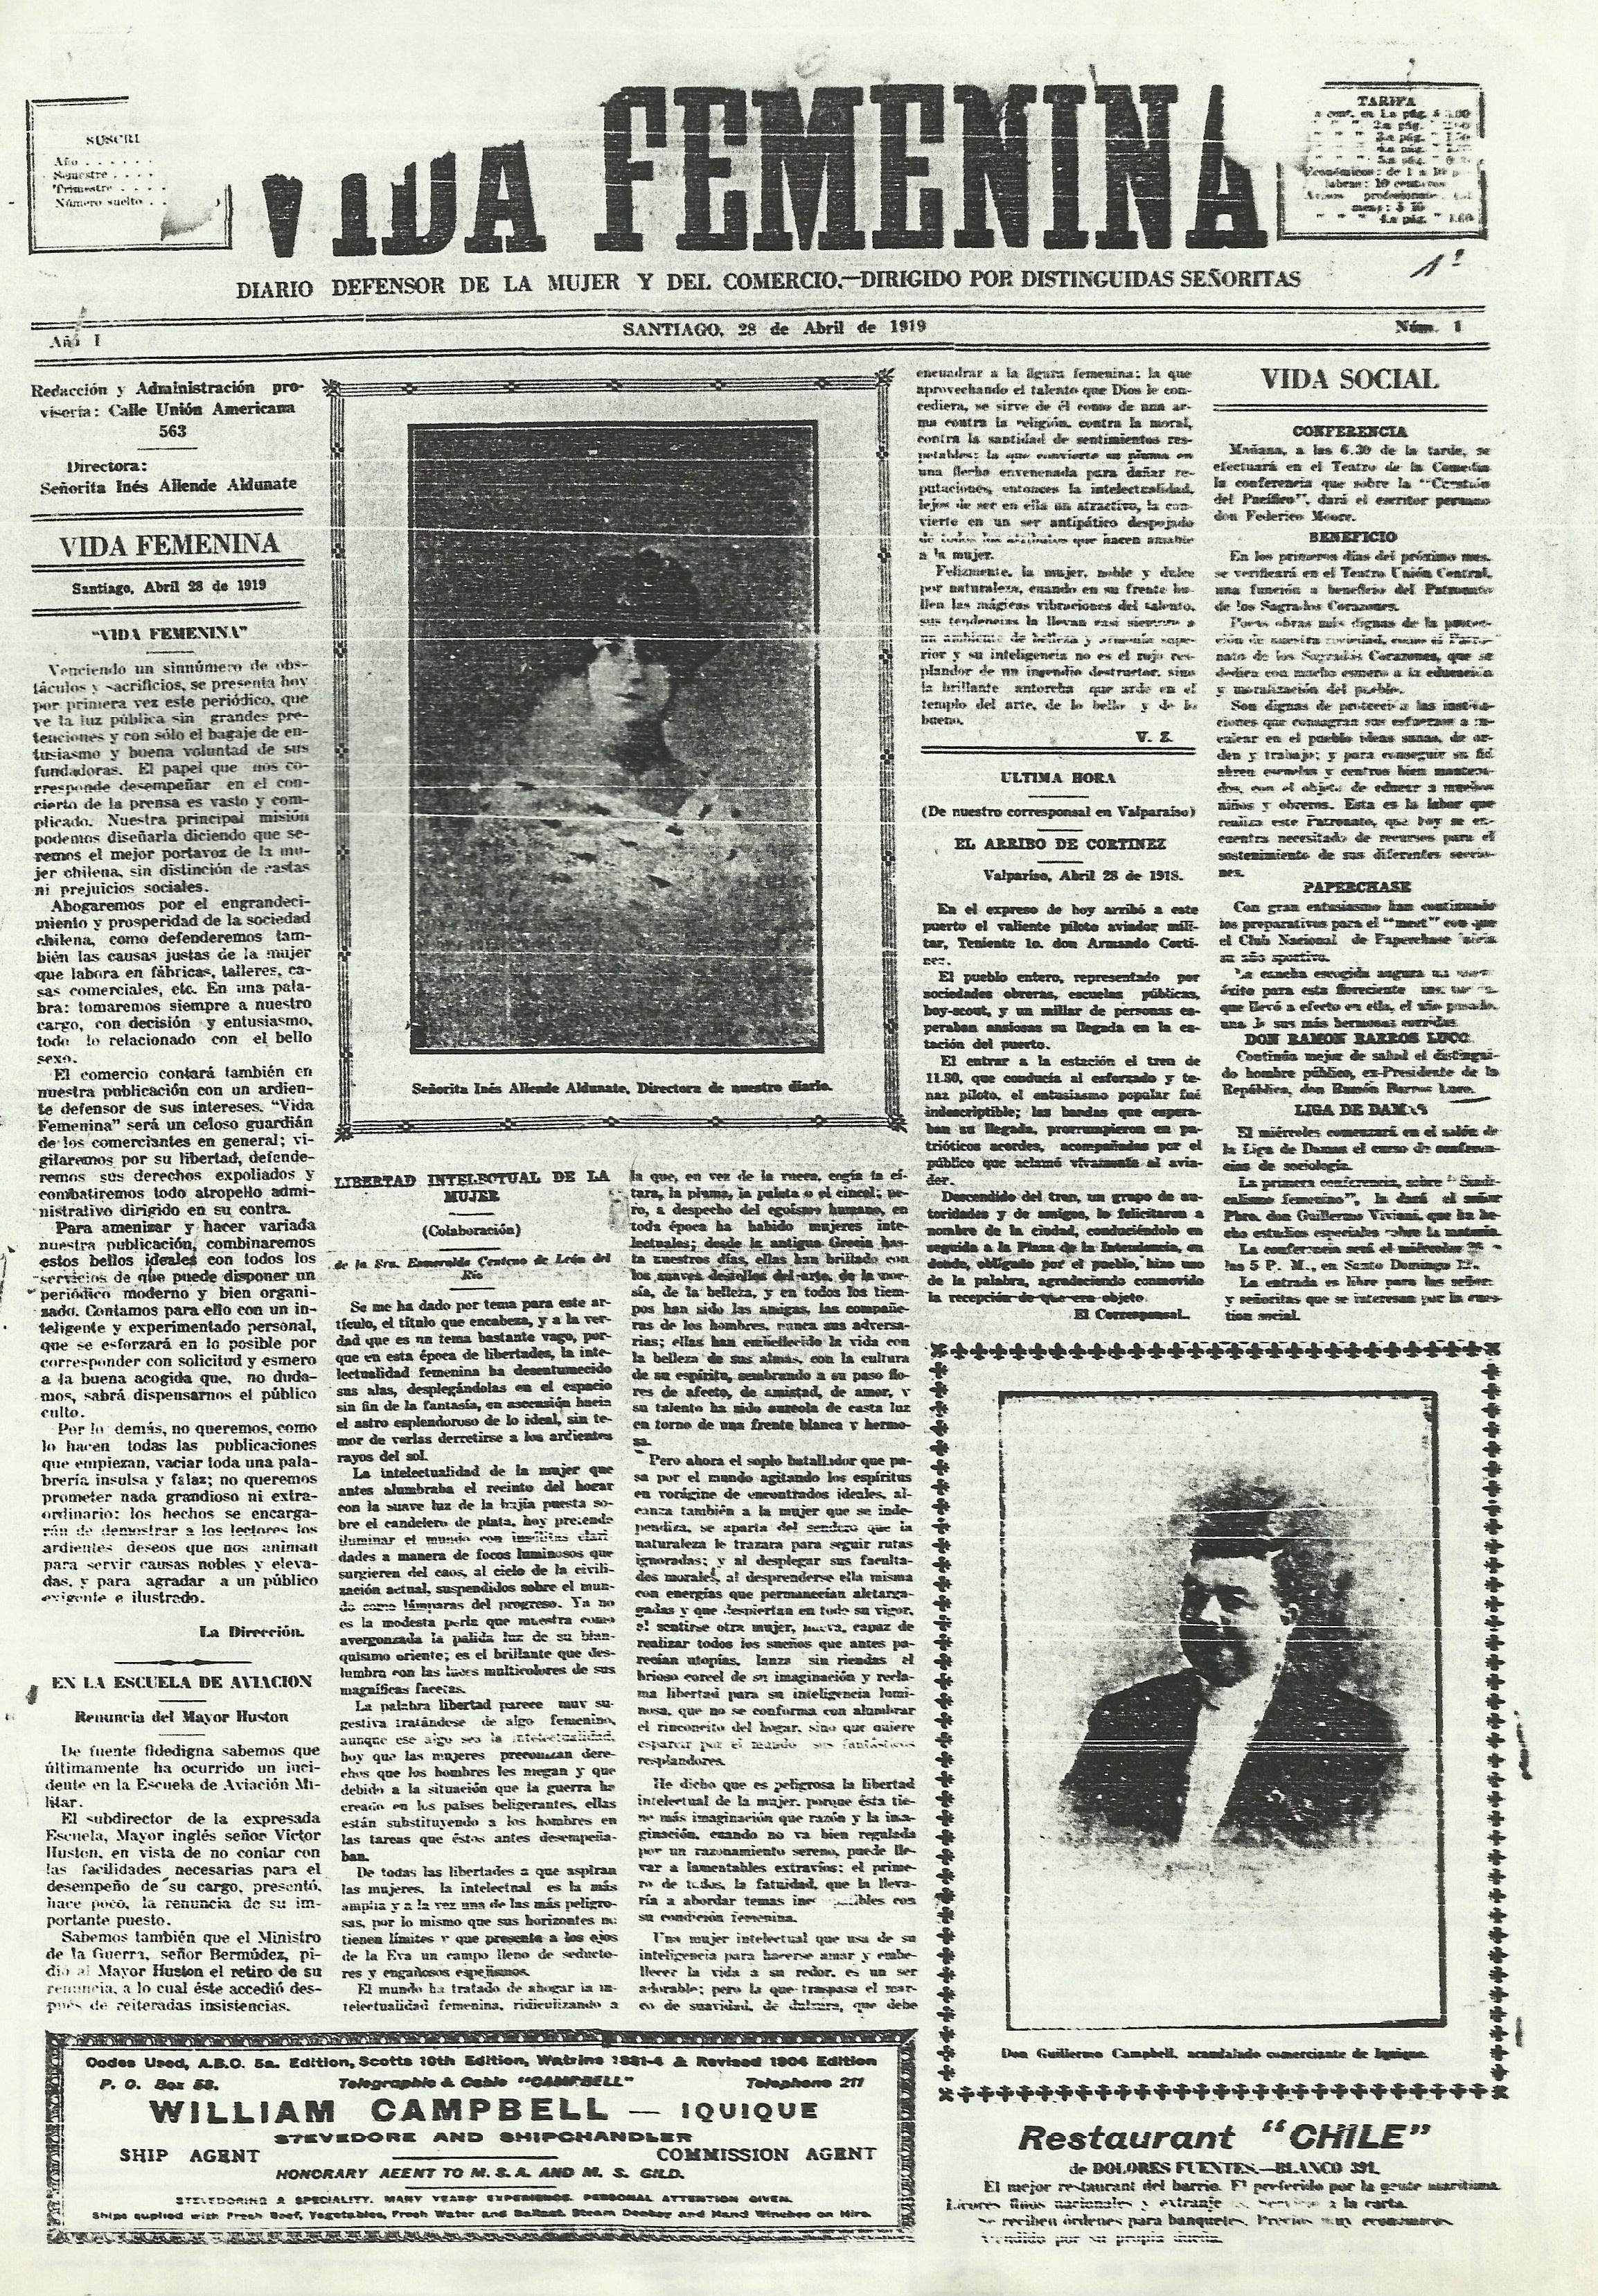 Vida Femenina nº 1, pág. 1